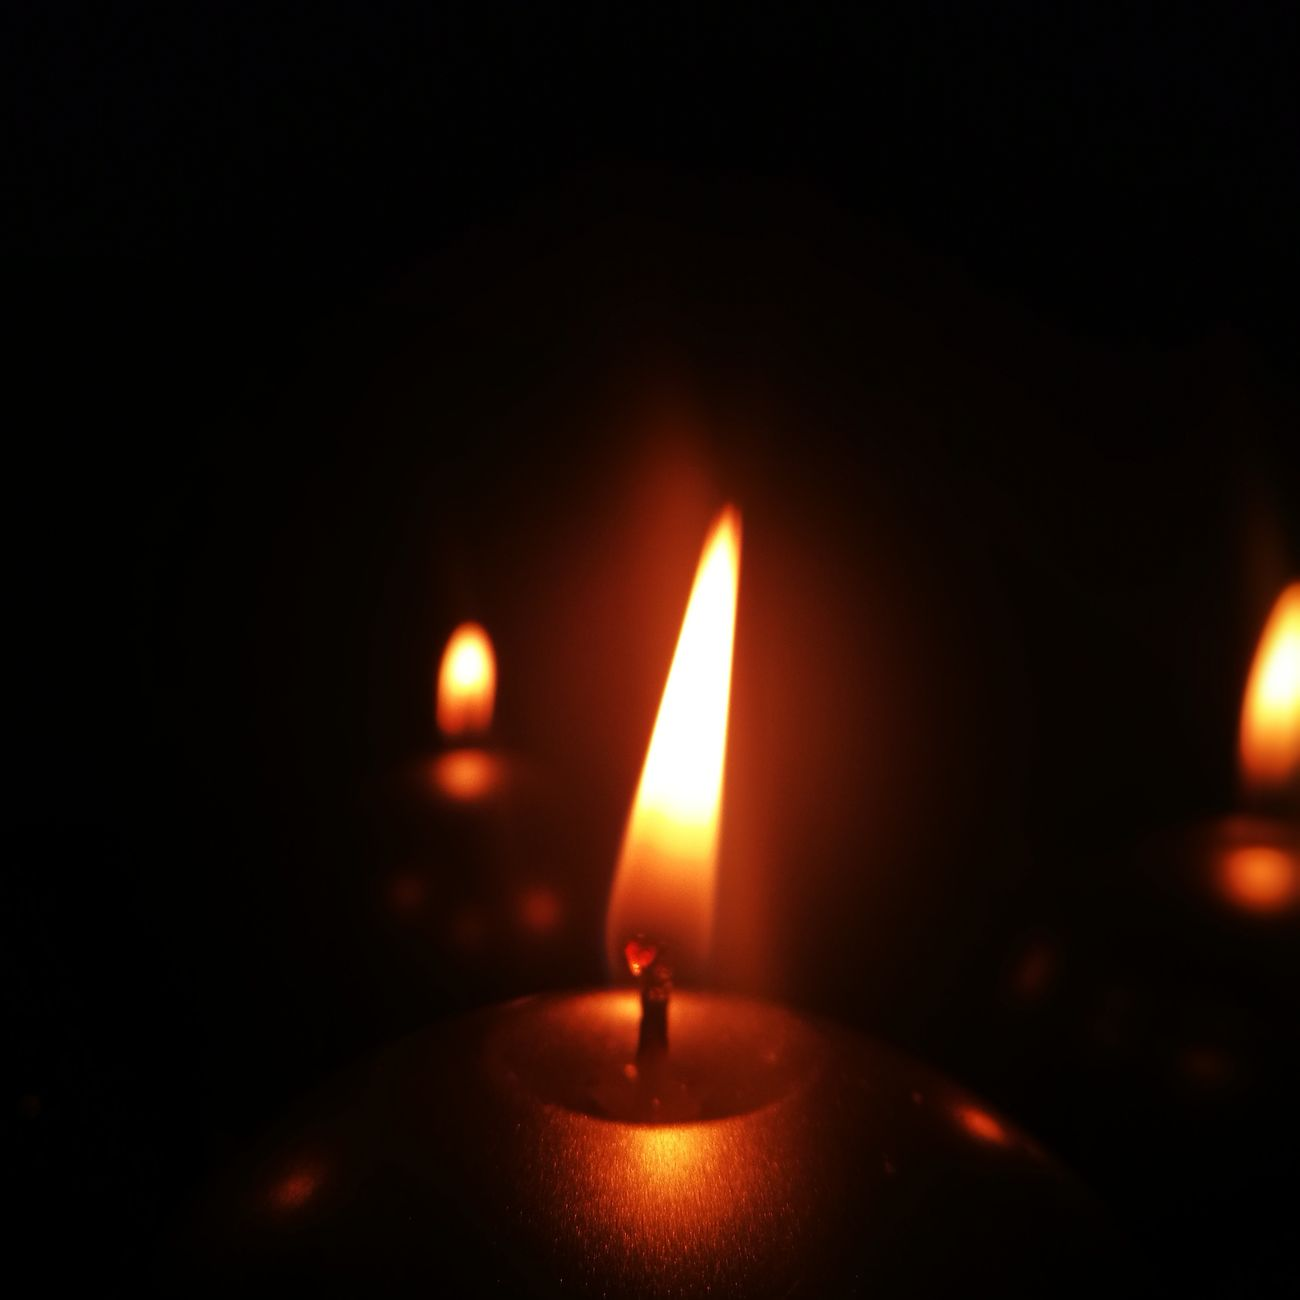 Candles Flame Burning Heat - Temperature Cultures No People Indoors  Oil Lamp Diya - Oil Lamp Diwali Close-up Illuminated Night